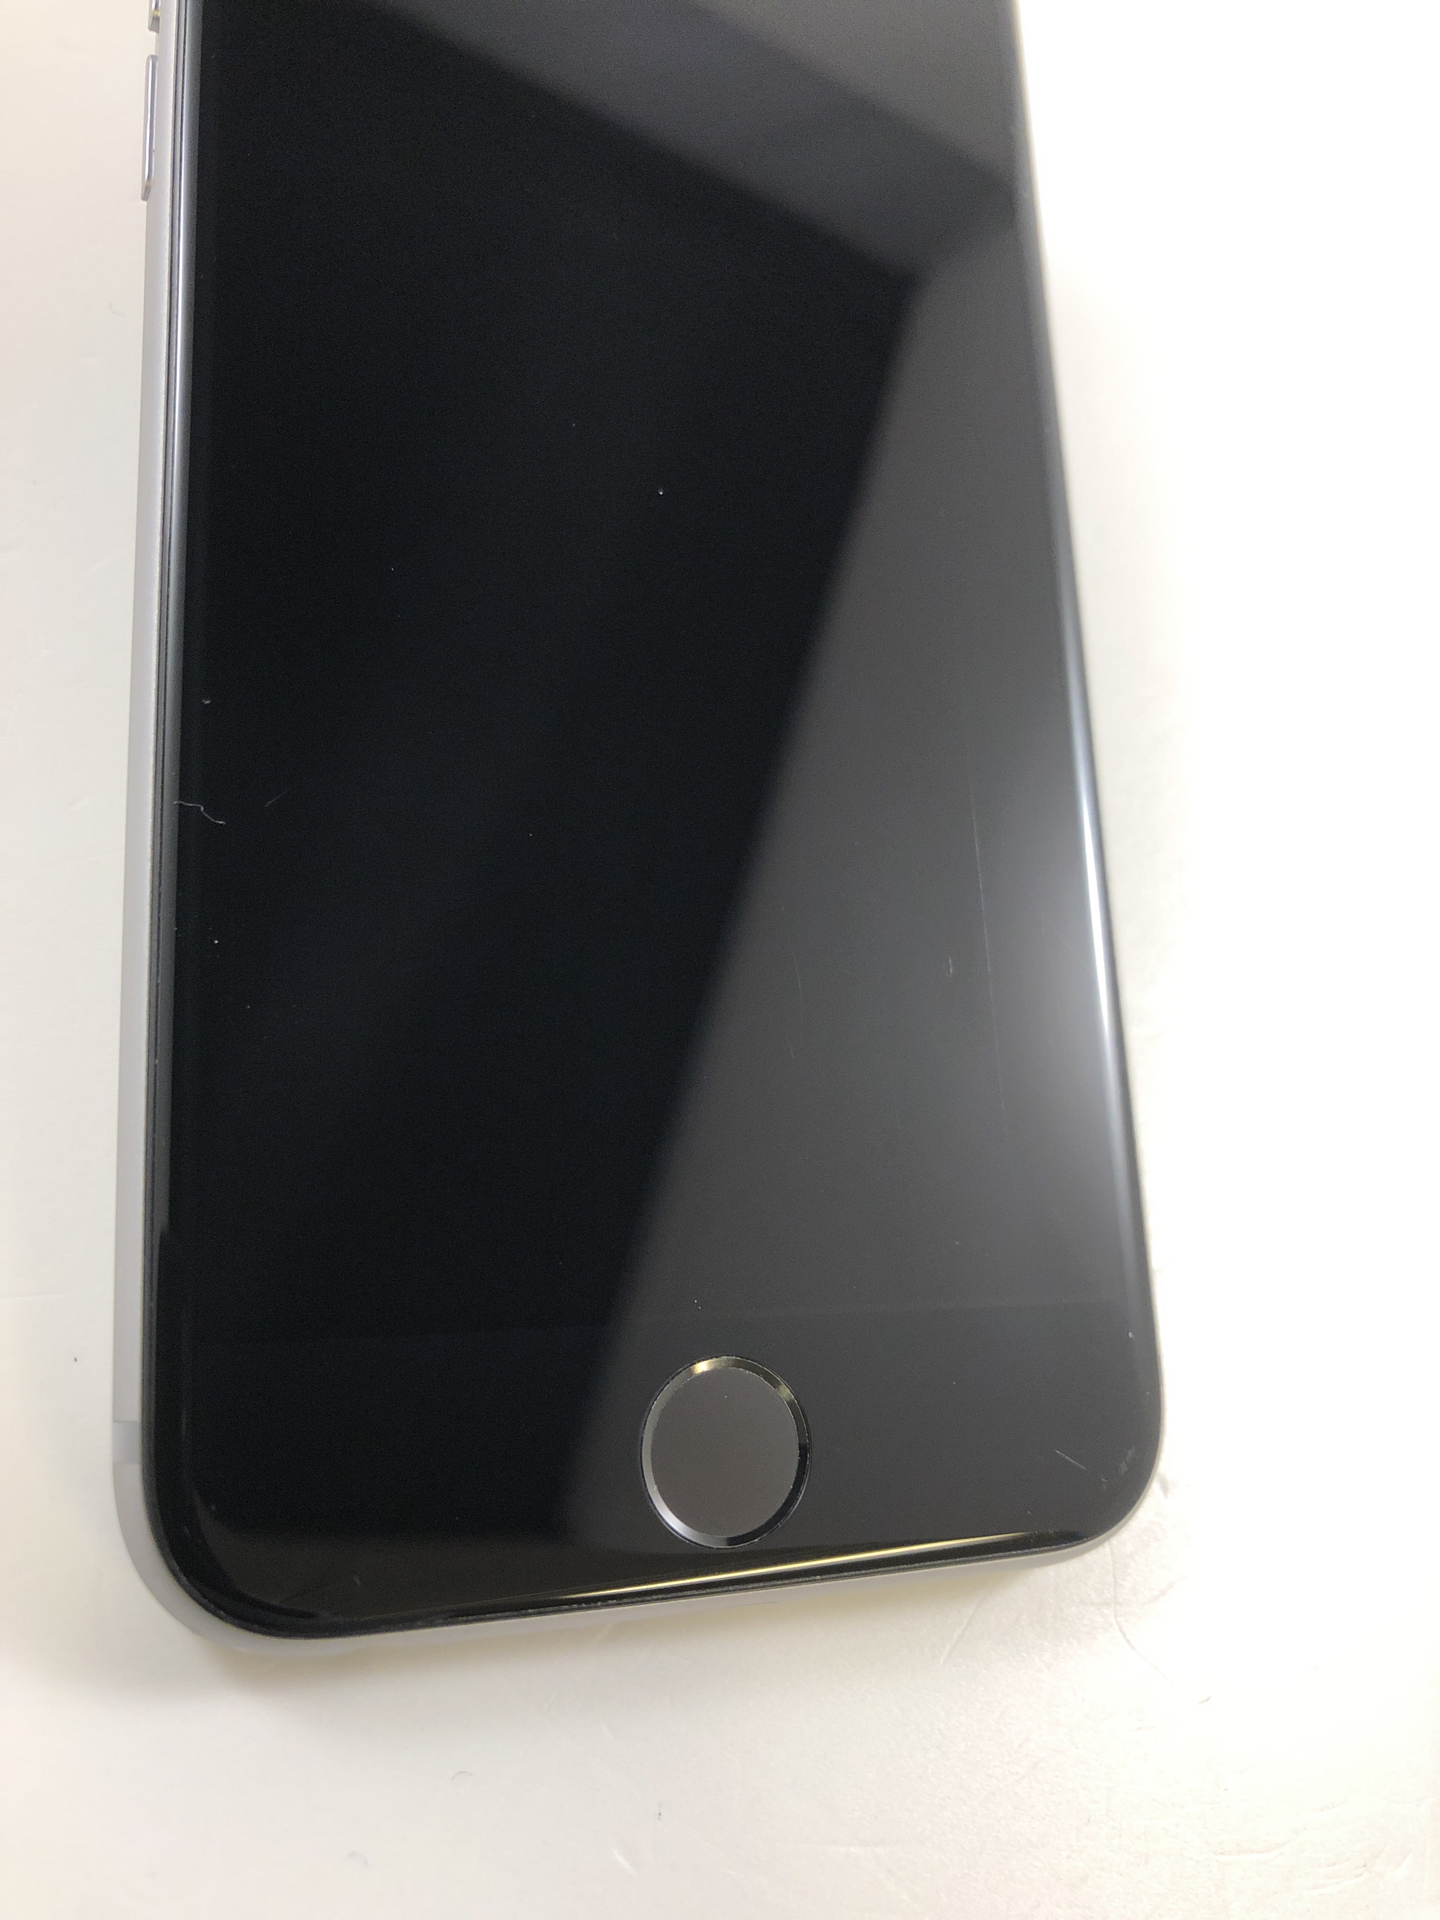 iPhone 6S 16GB, 16GB, Space Gray, bild 3